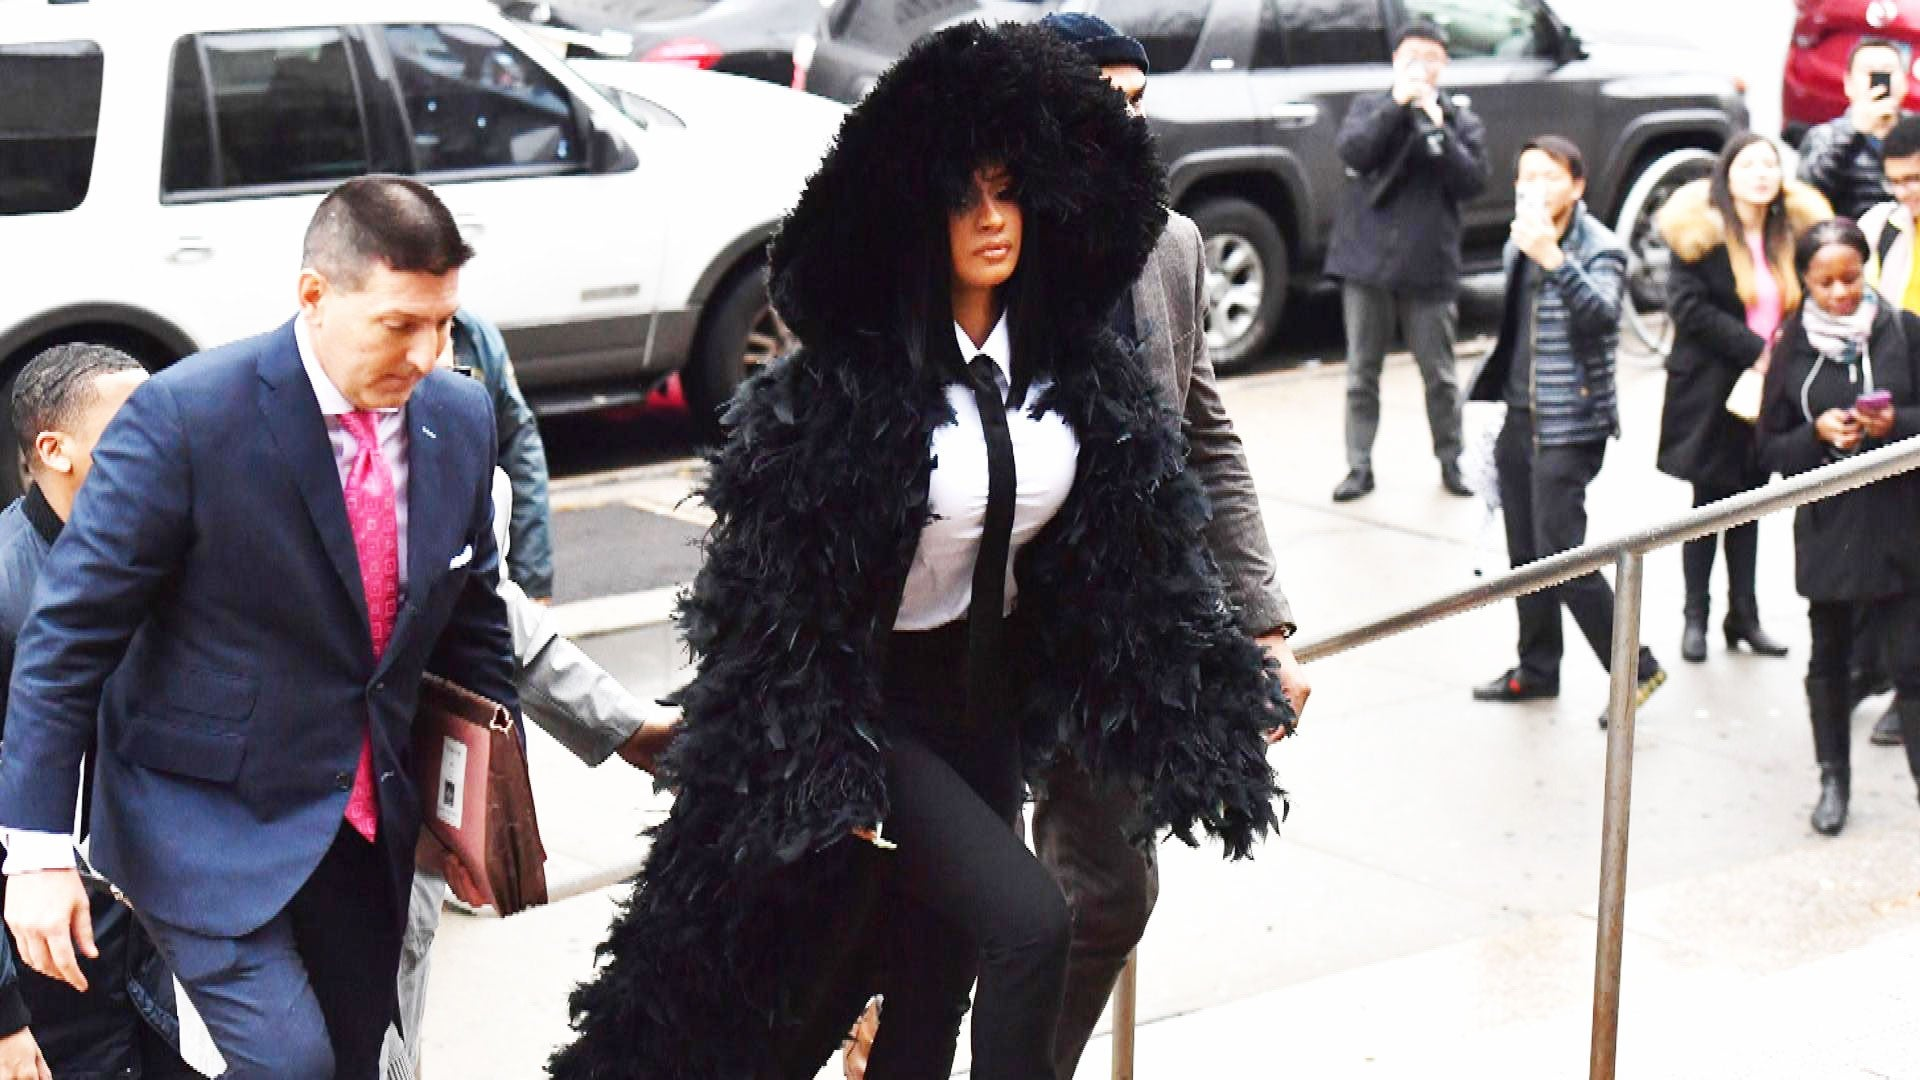 Cardi B wears see-through catsuit and ski mask for Paris Fashion Week